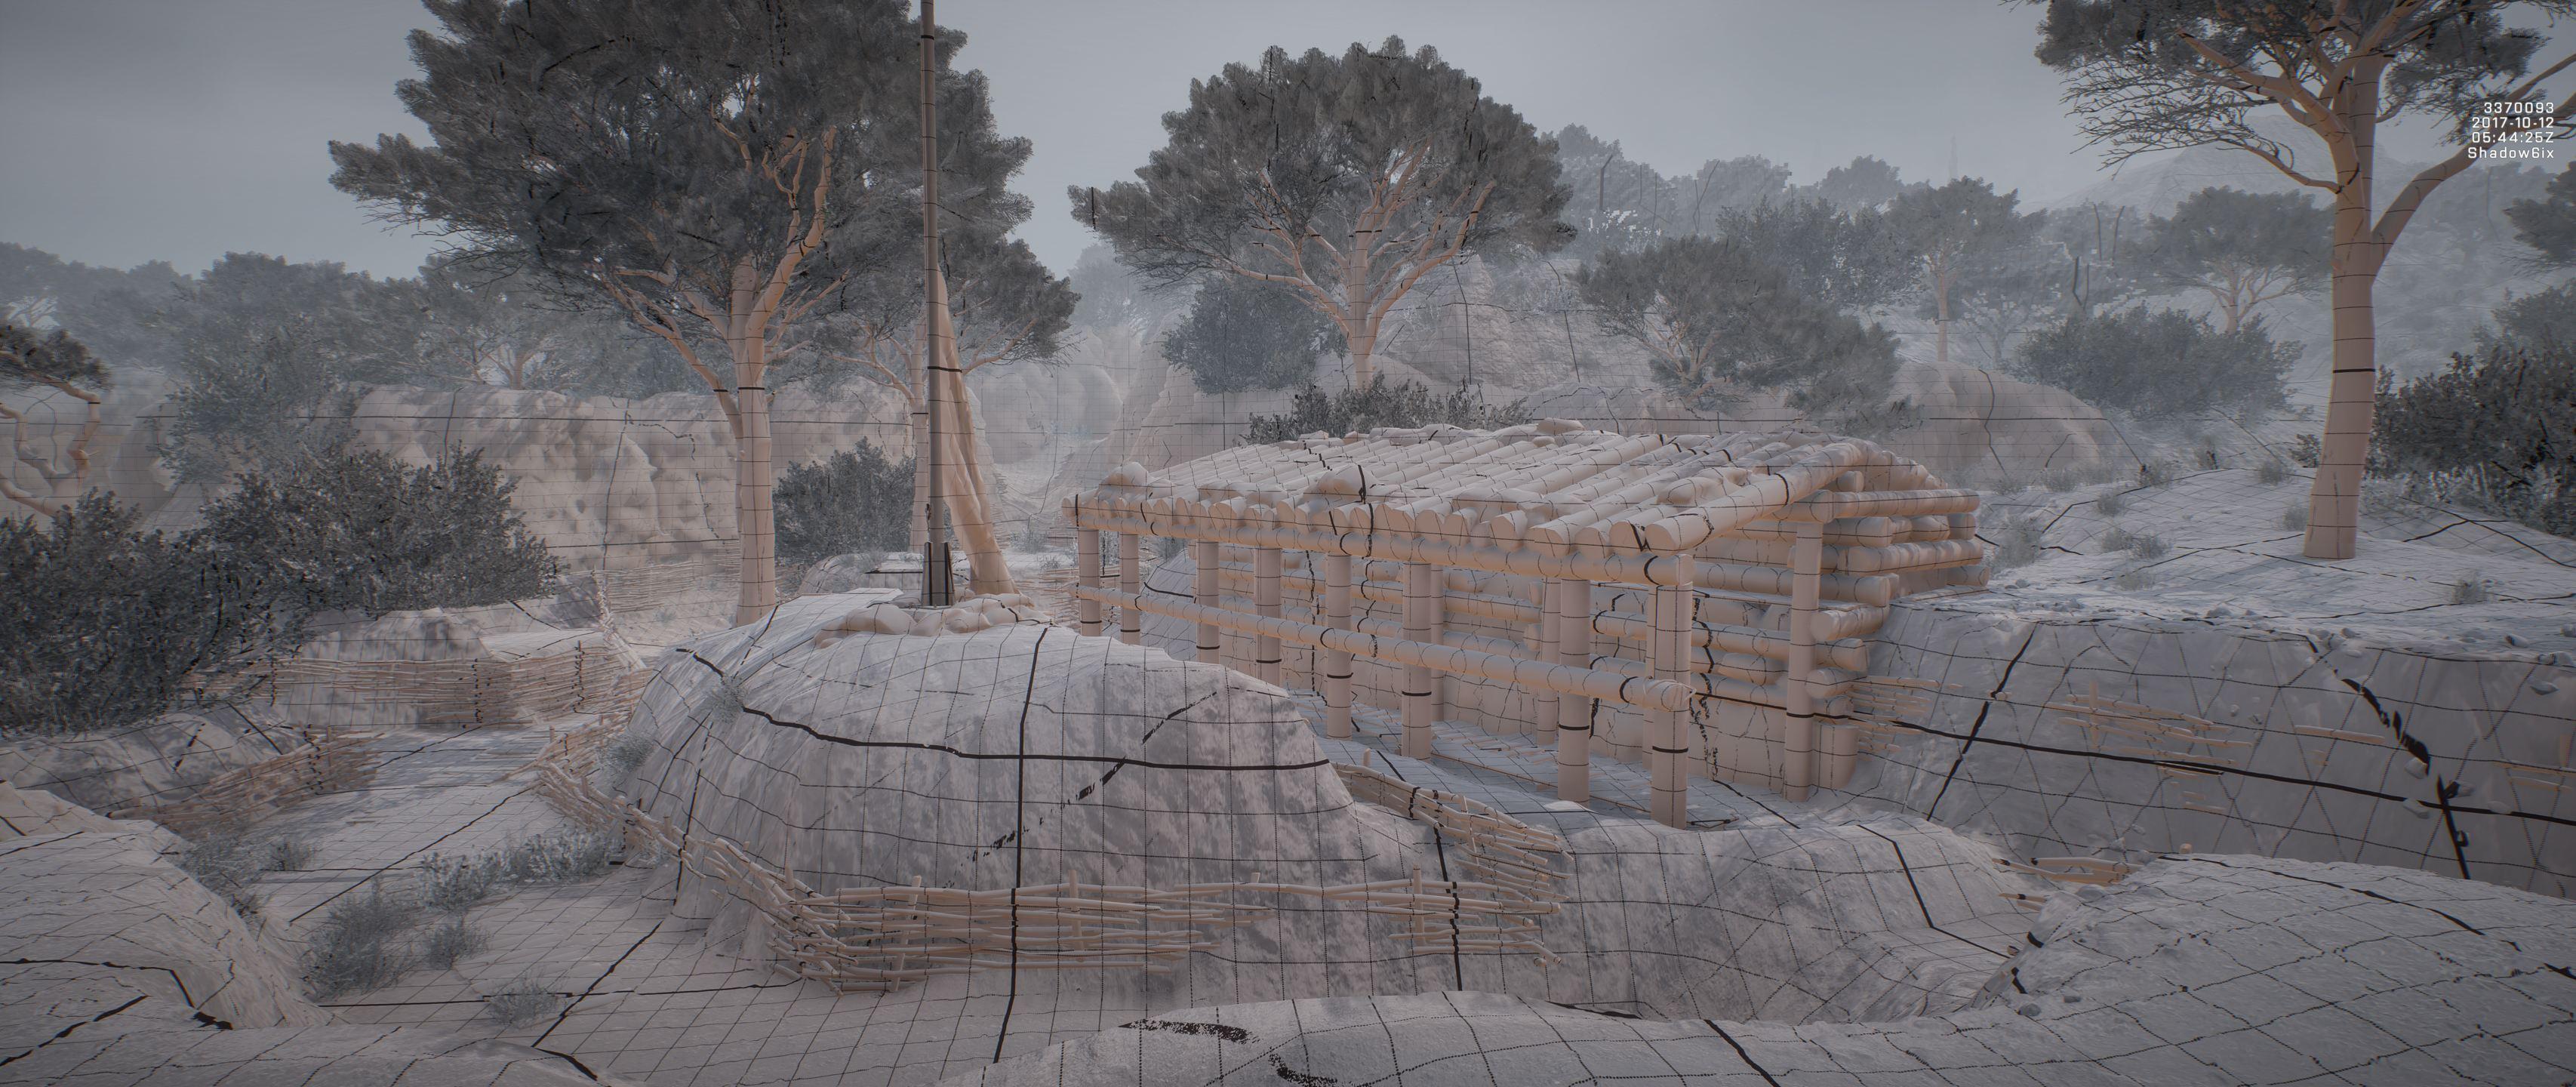 Battlefiled 1. Turning Tides - Ачи Баба - Battlefield 1 DLC, Арт